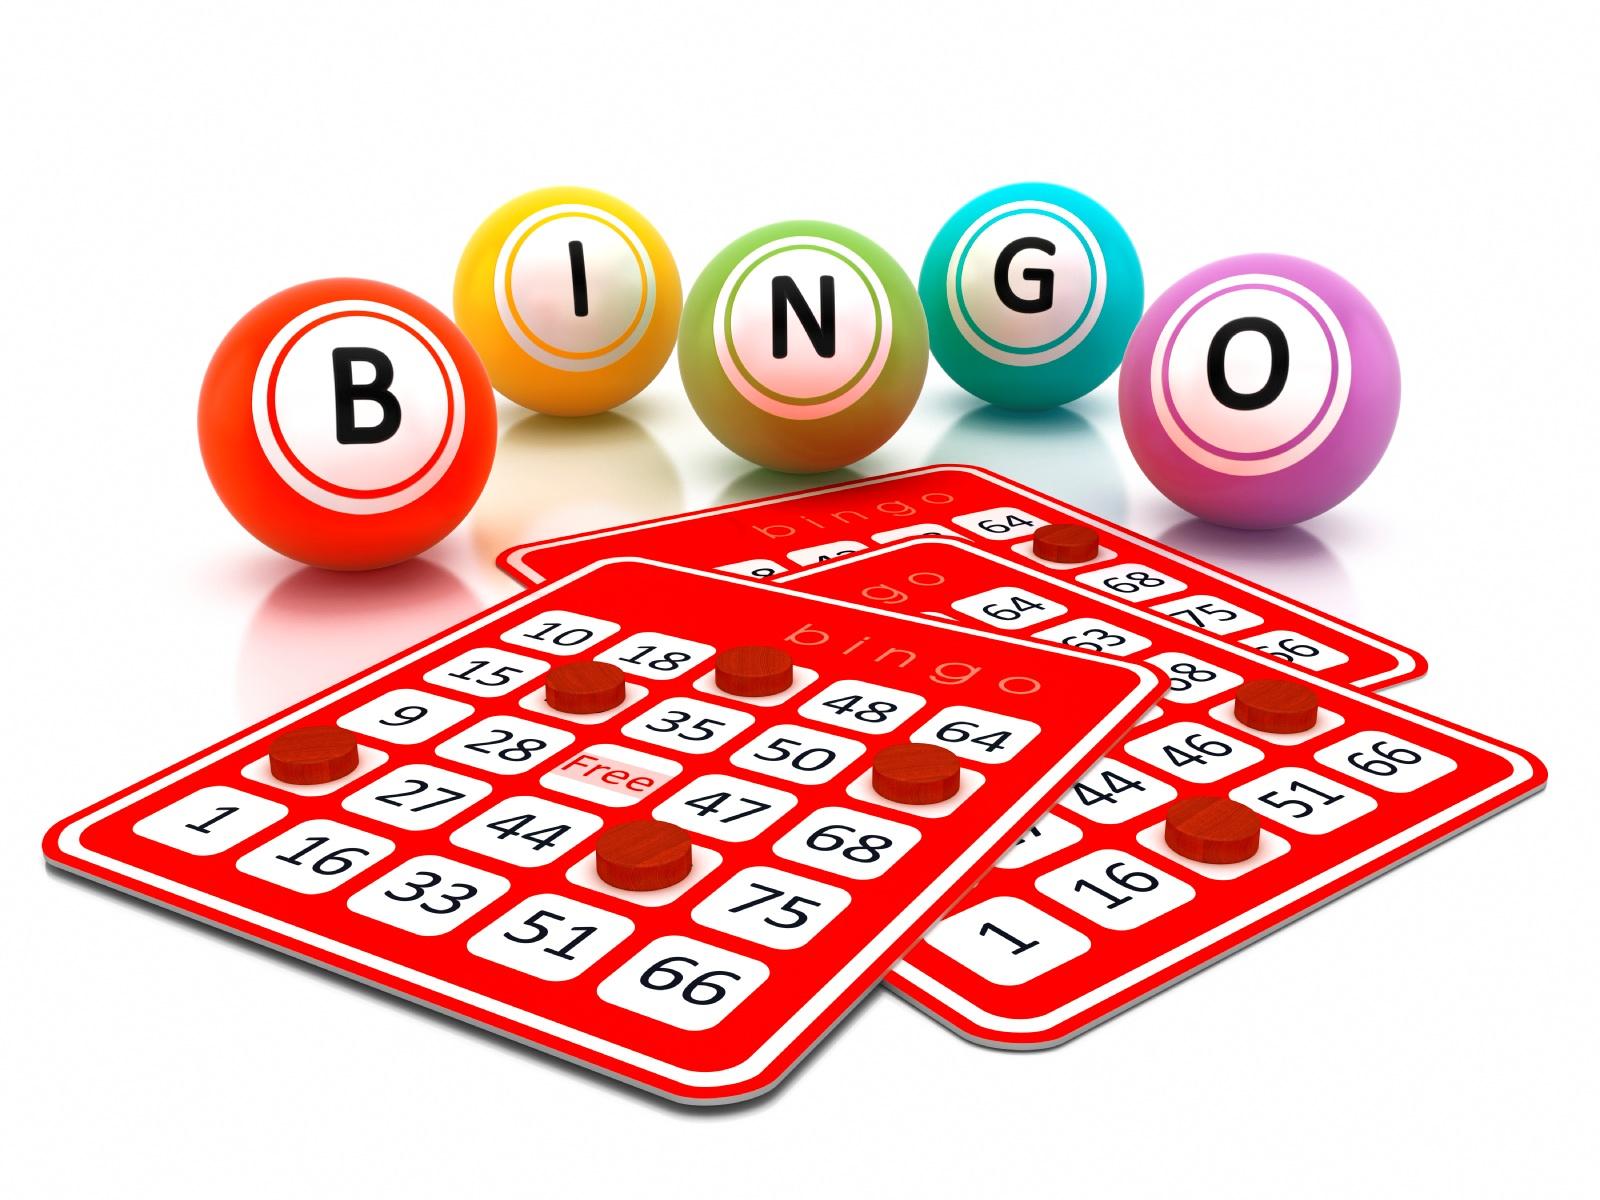 ¡Bingo! Del cartón a tu computadora